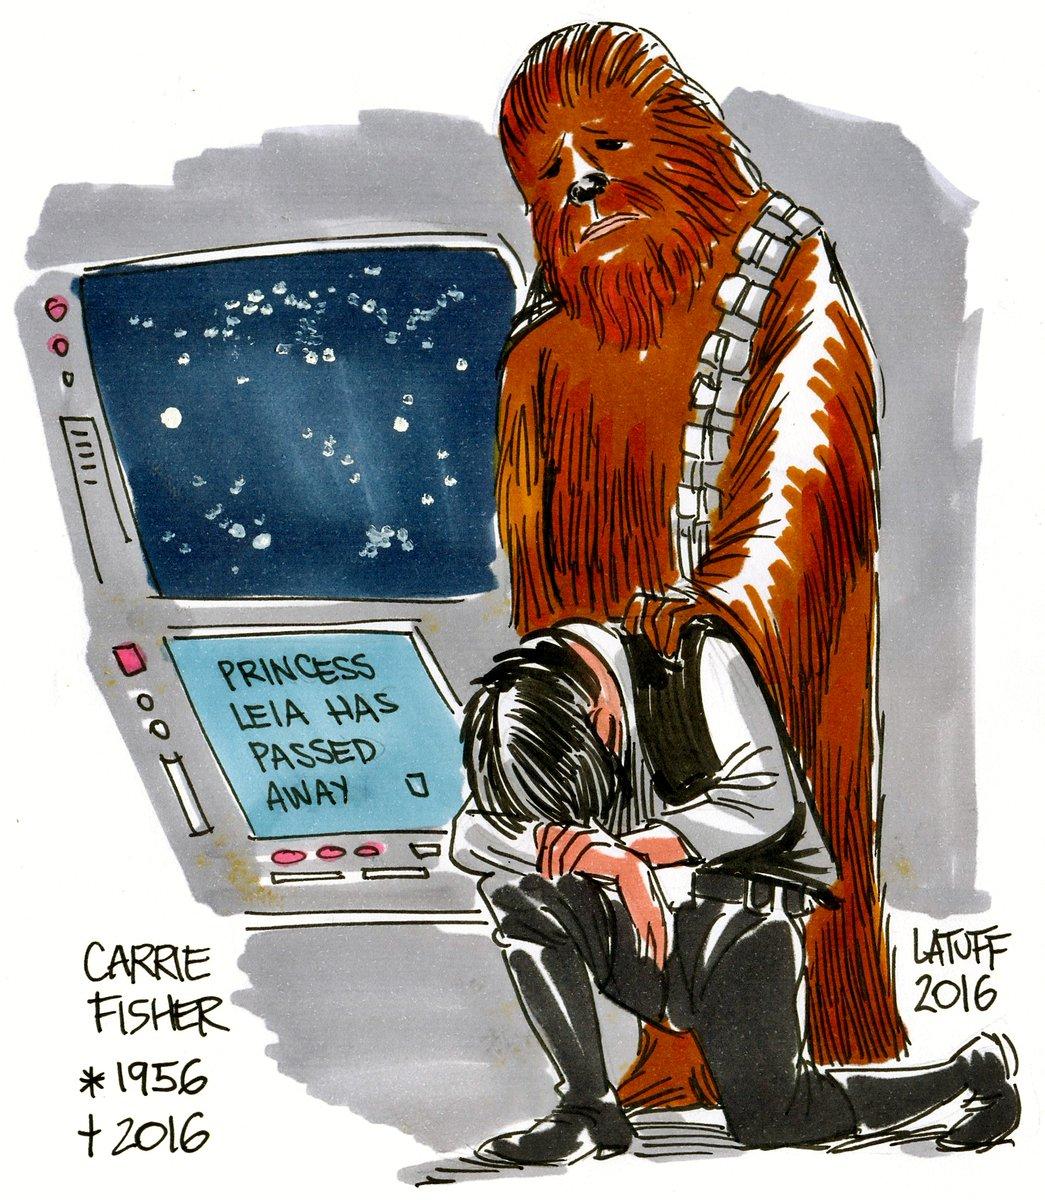 Carlos Latuff RIP Carrie Fisher